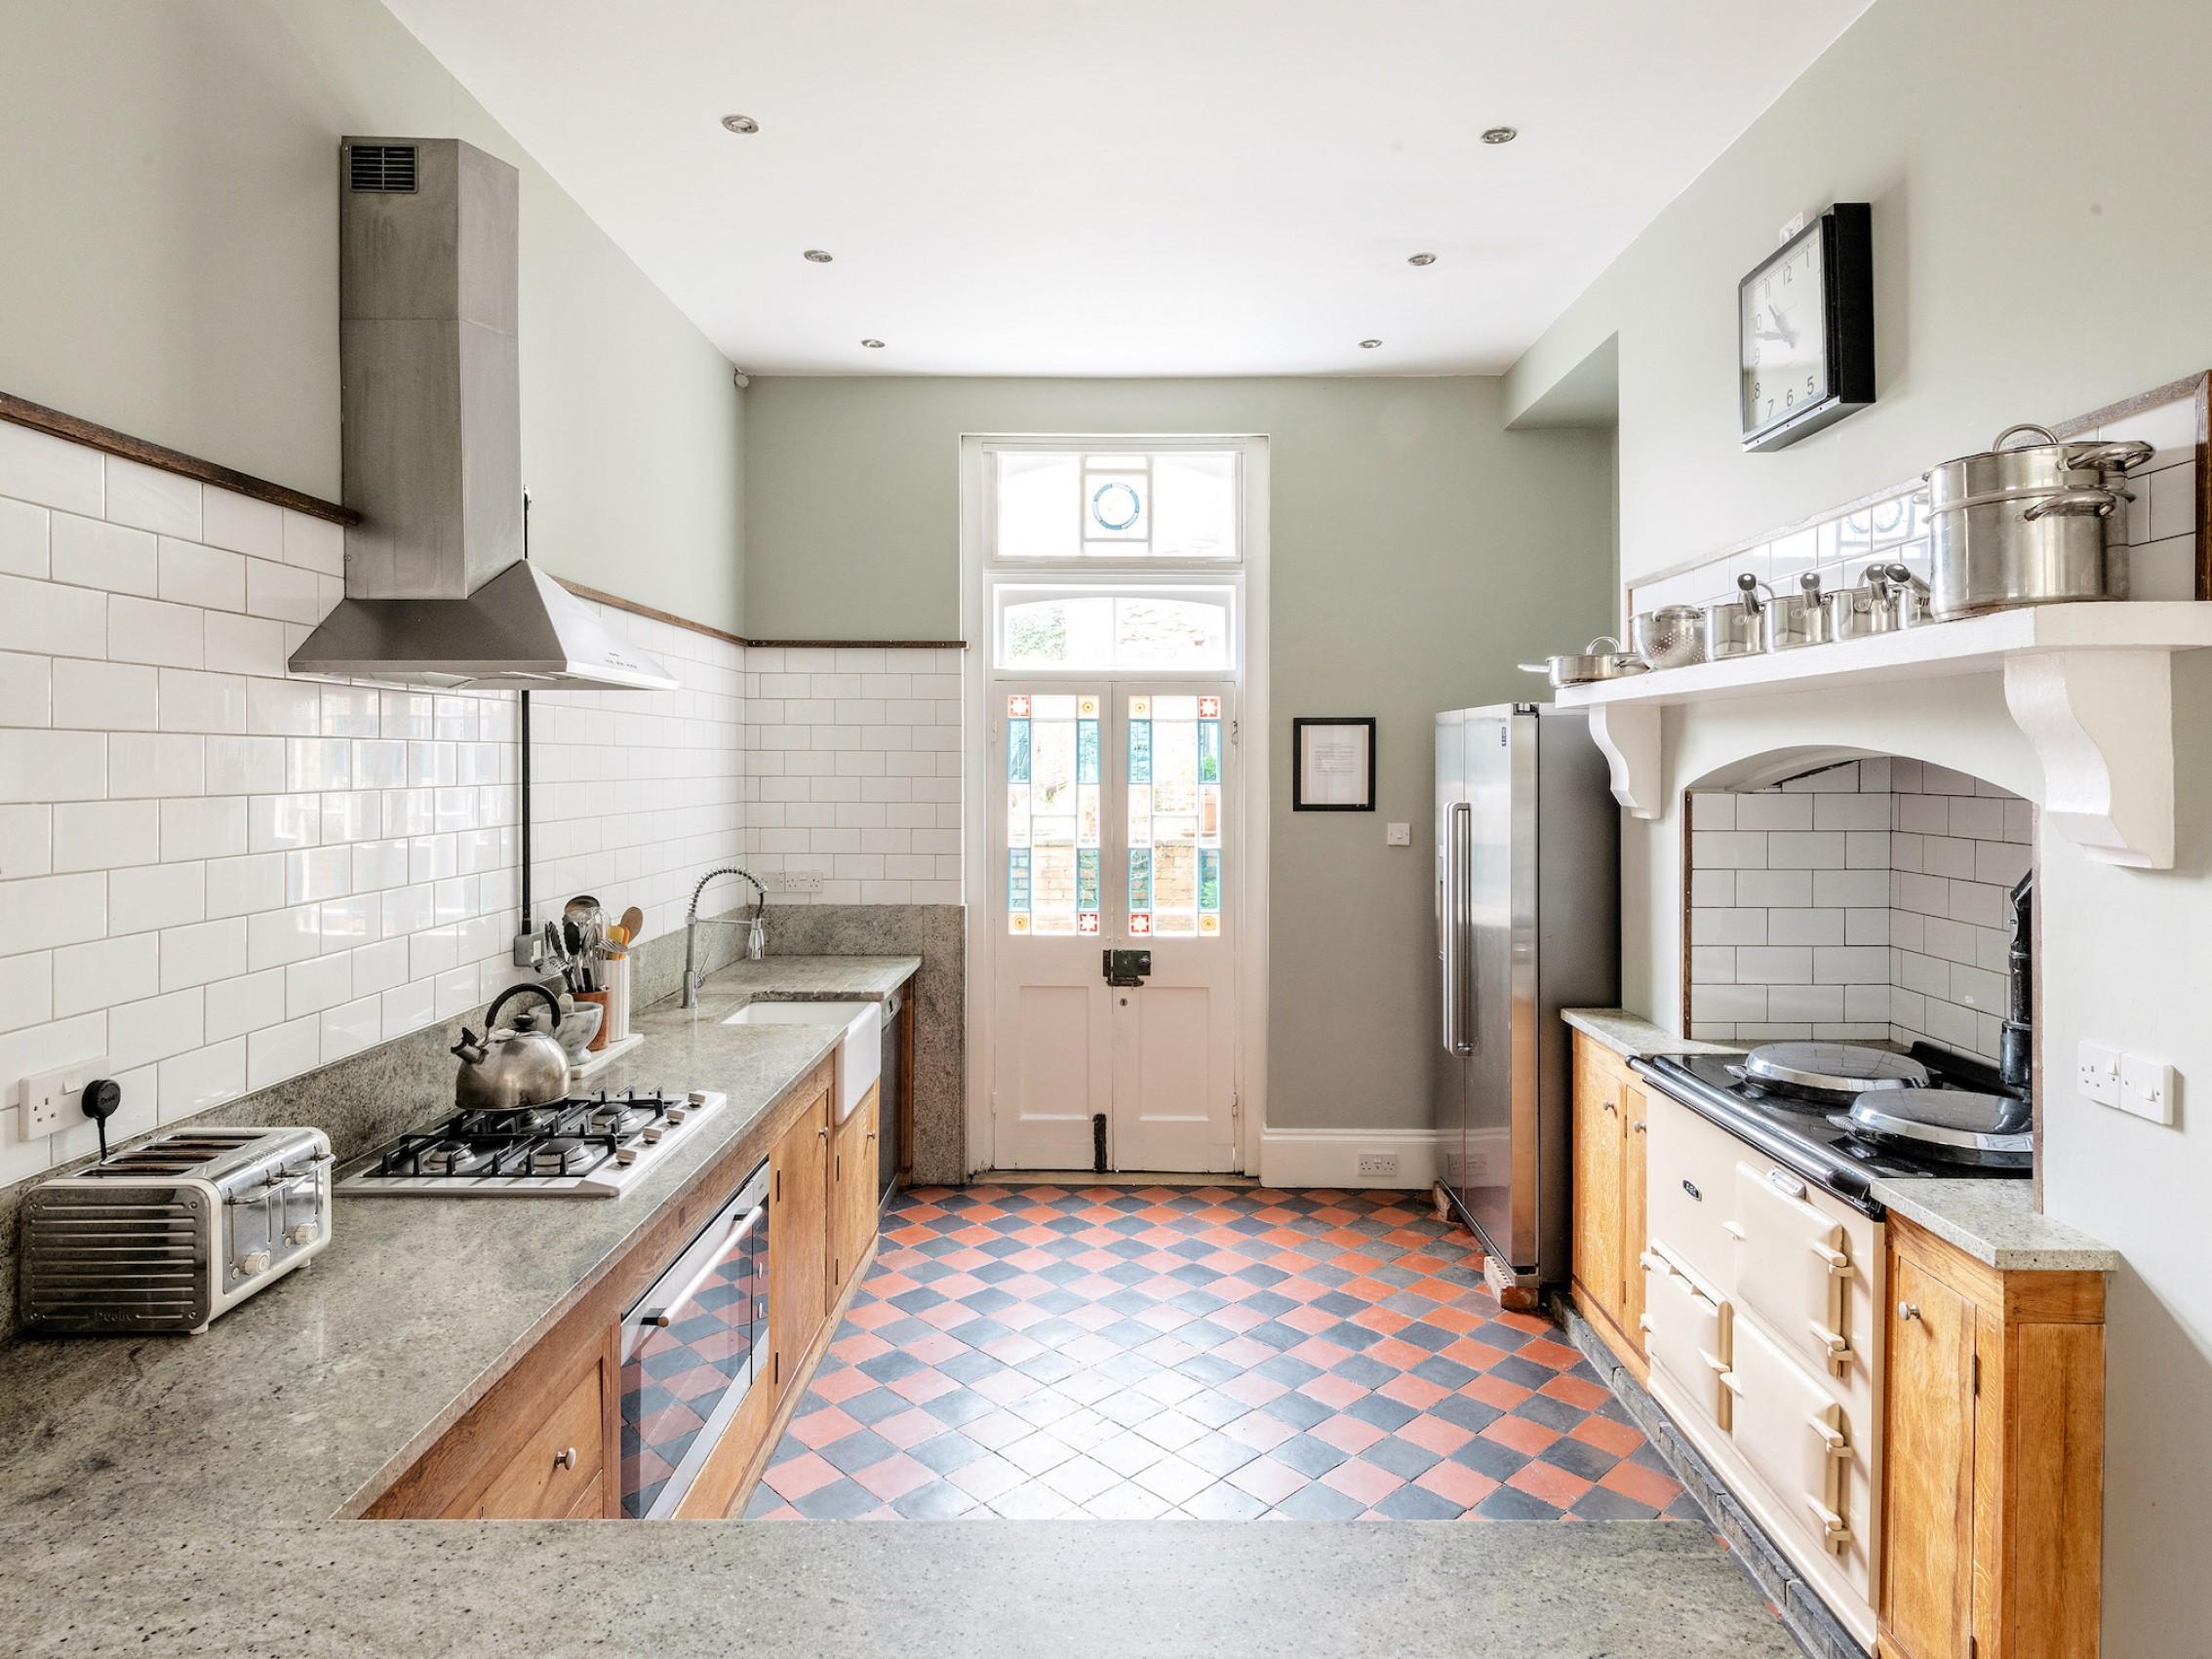 Kitchen, AGA, Miele oven & gas hob